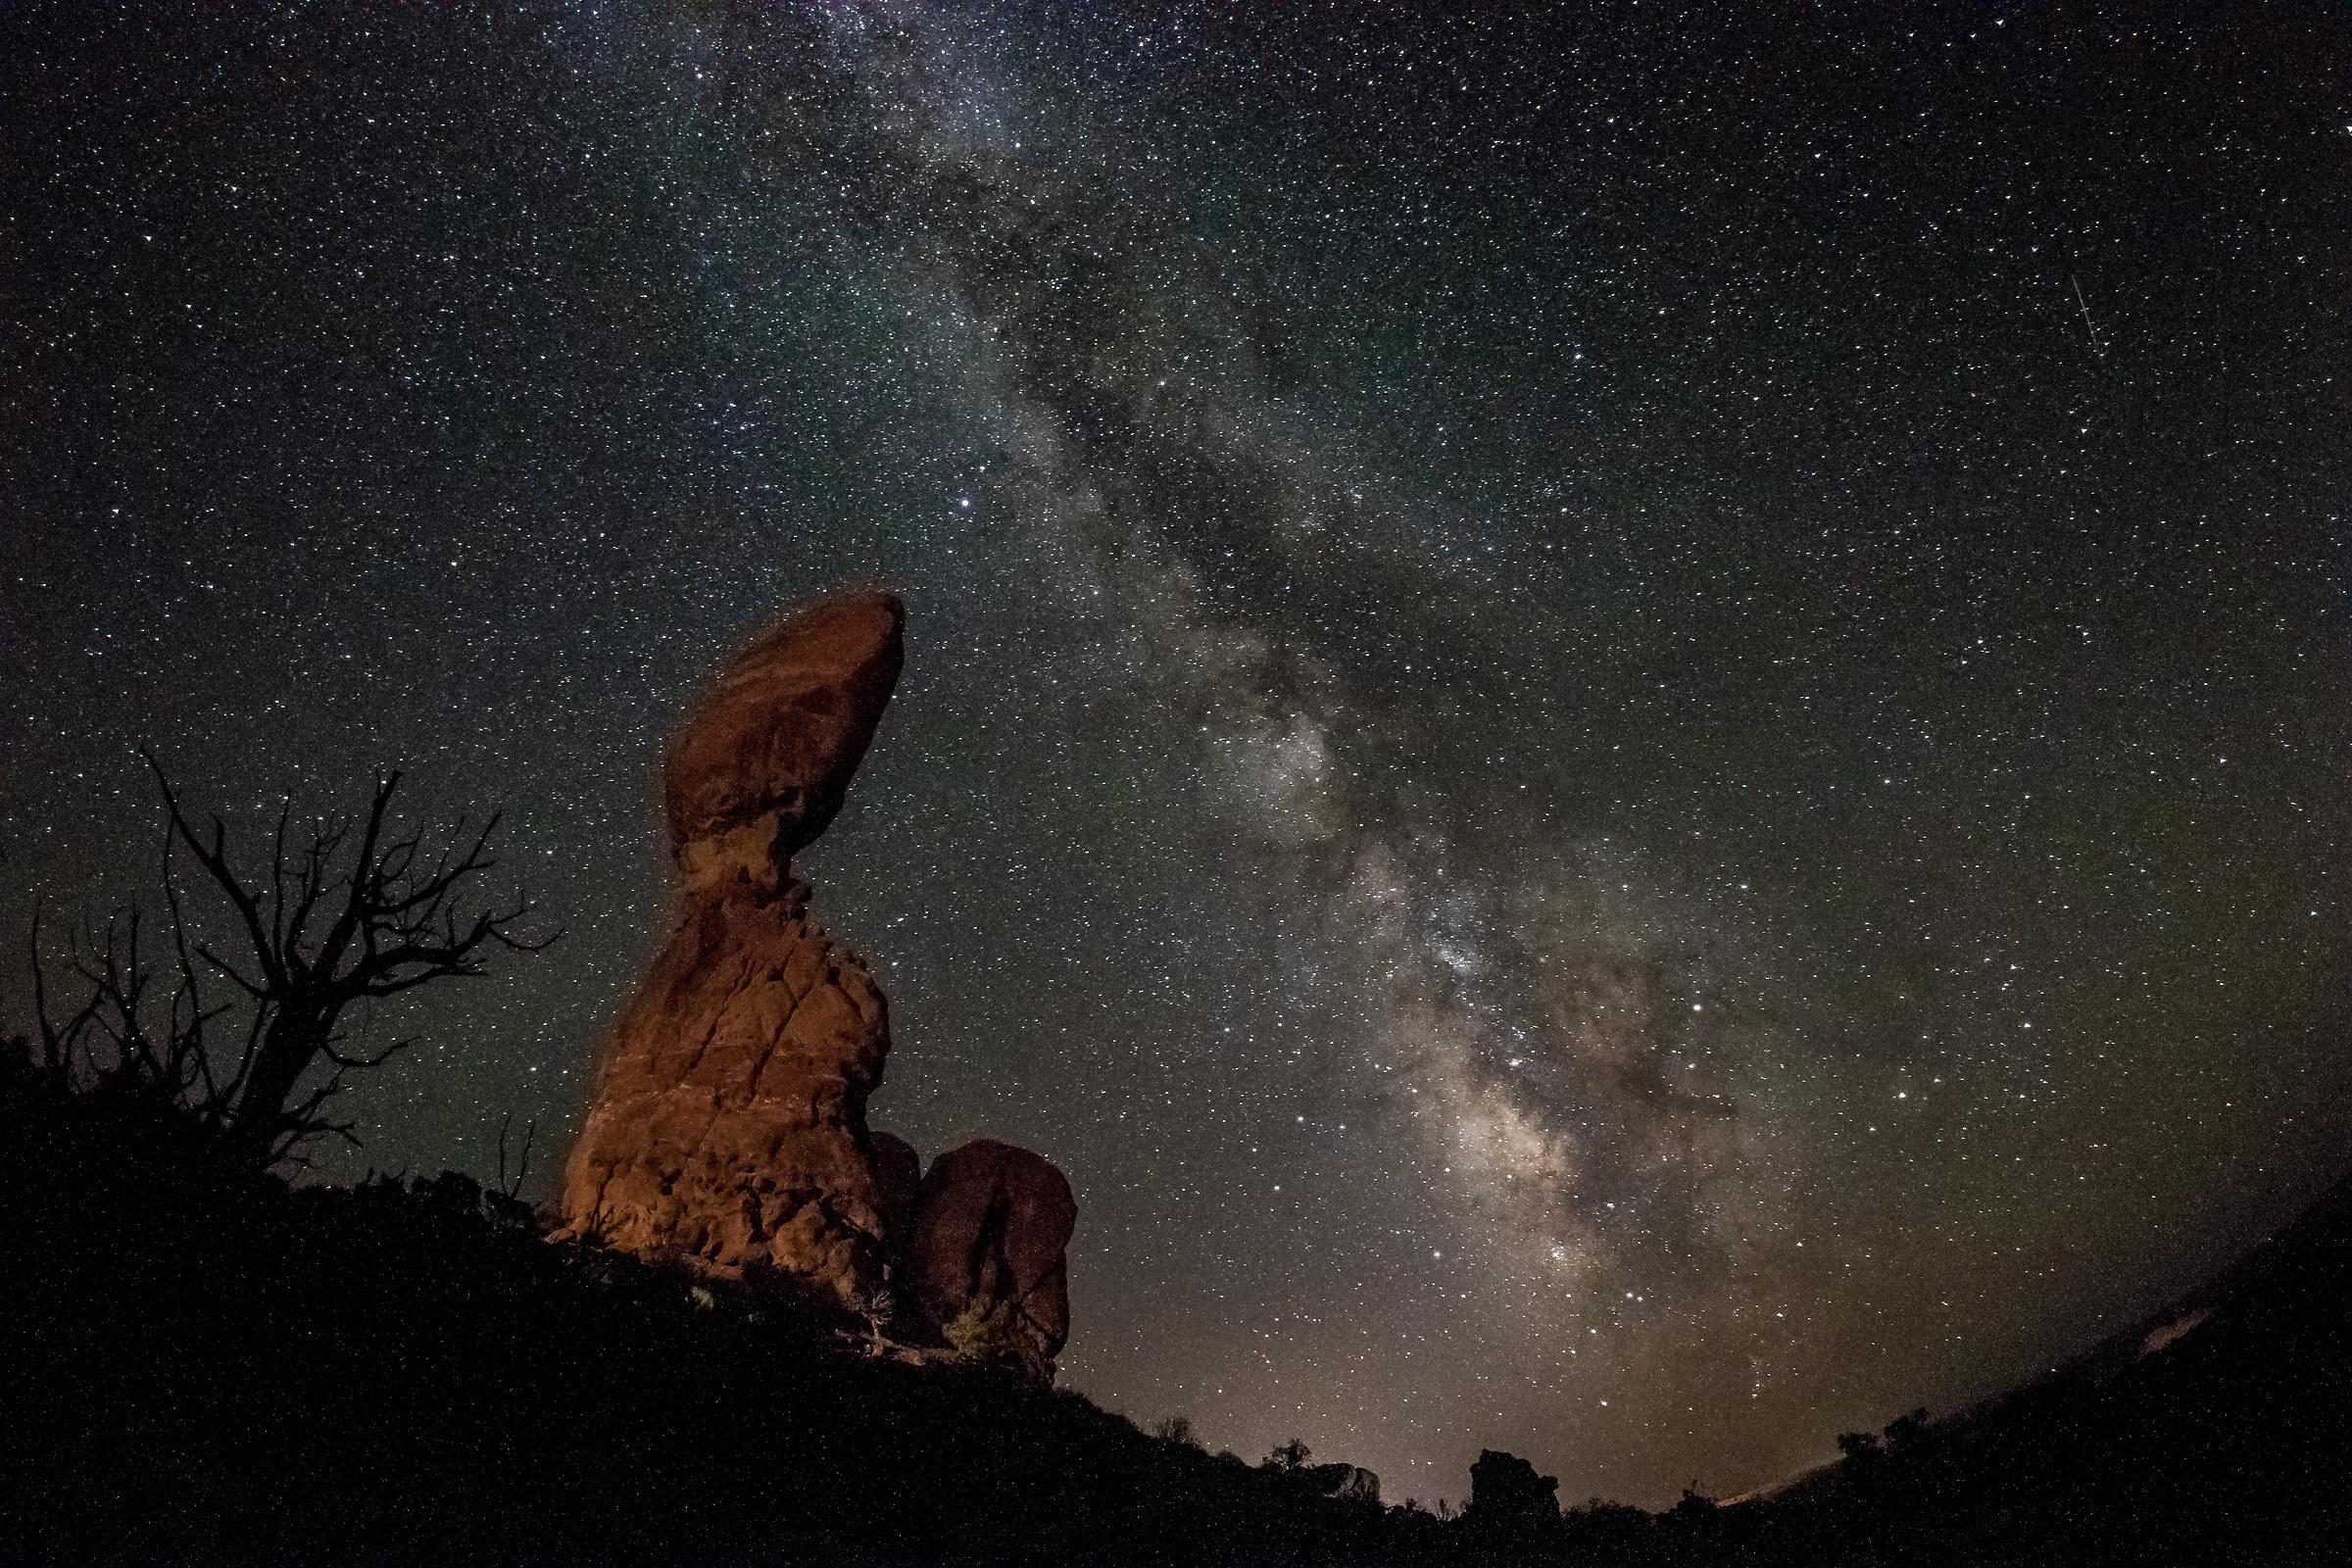 Milky Way over the Balanced Rock...